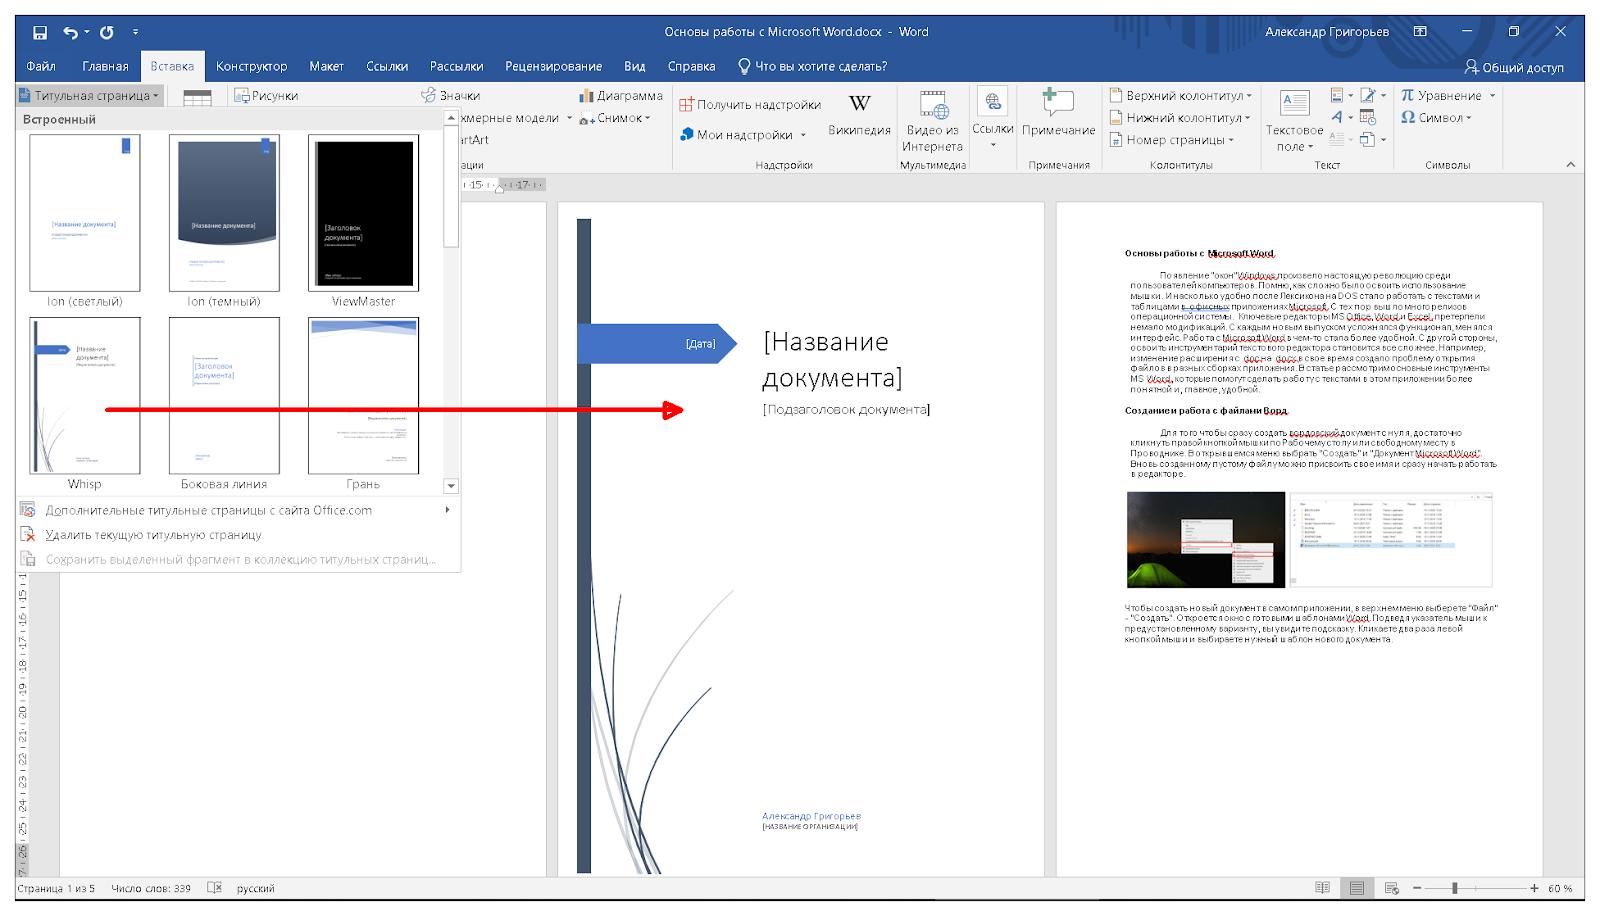 шаблоны для заглавных страниц разных документов MS Word